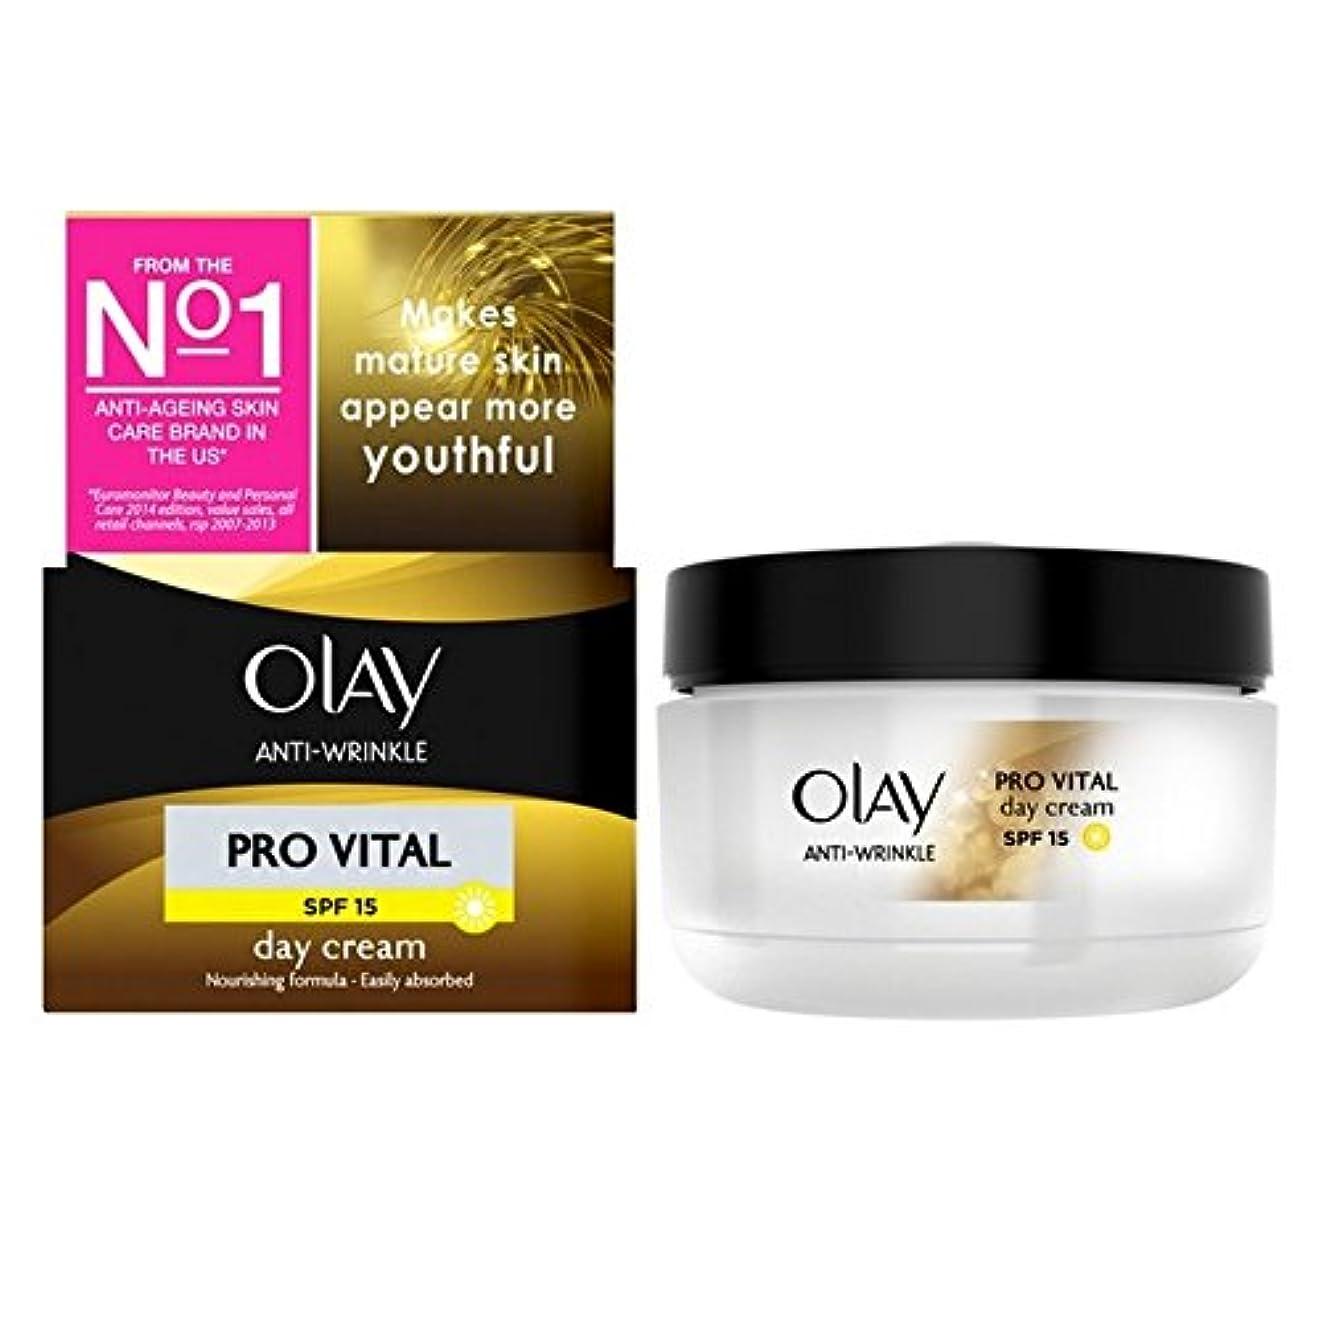 Olay Anti-Wrinkle Pro Vital Moisturiser Day Cream Mature Skin 50ml - オーレイ抗しわプロ重要な保湿デイクリーム成熟した肌50ミリリットル [並行輸入品]